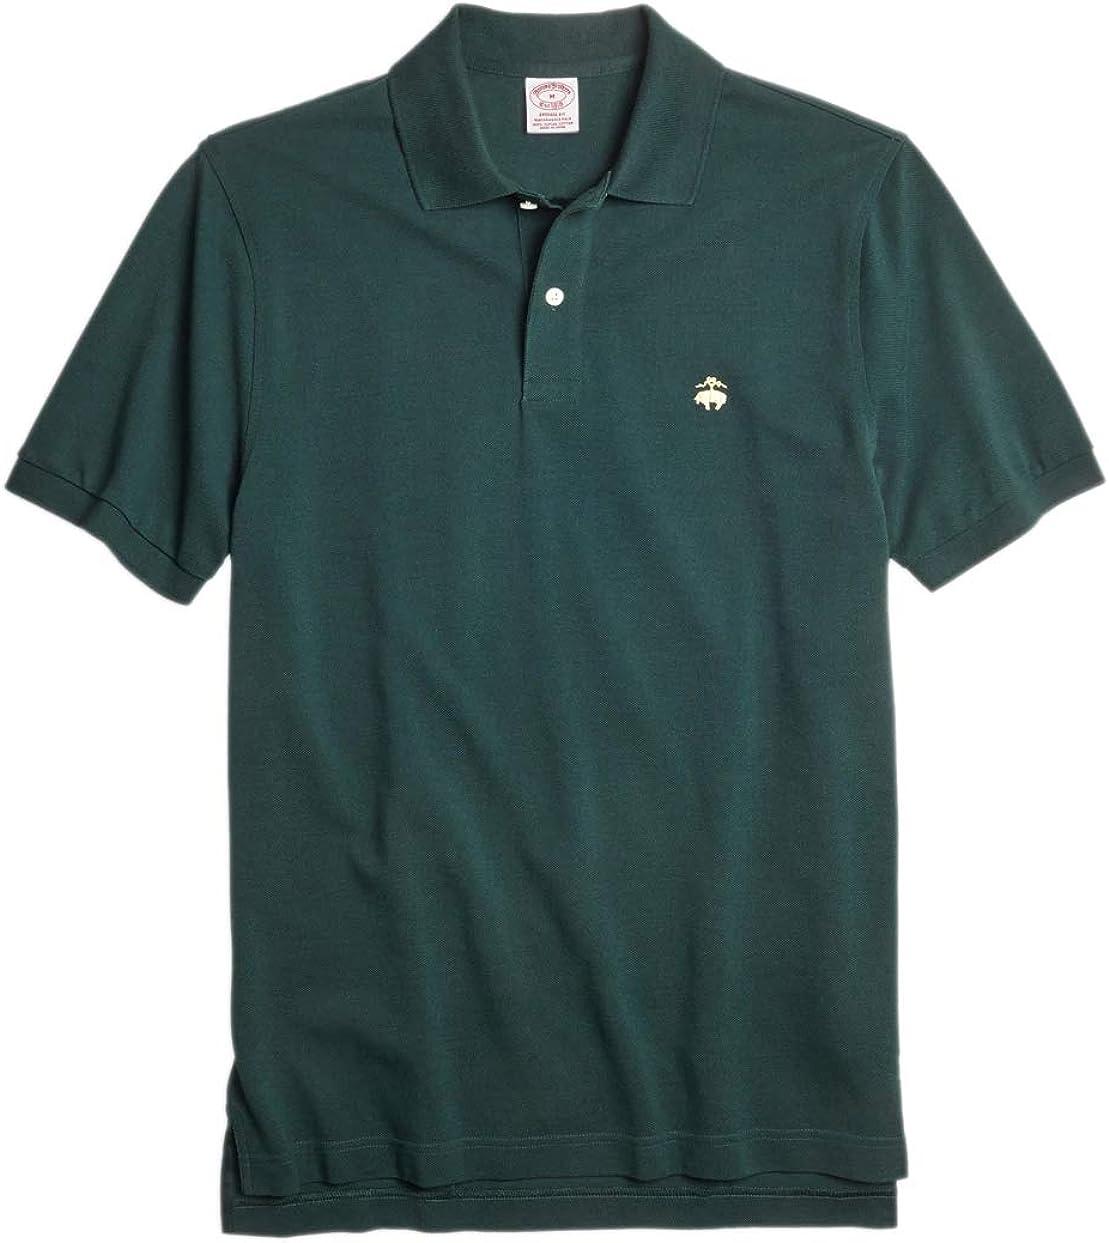 Brooks Brothers Men's Original Fit Performance Pique Cotton Polo Shirt Dark Green